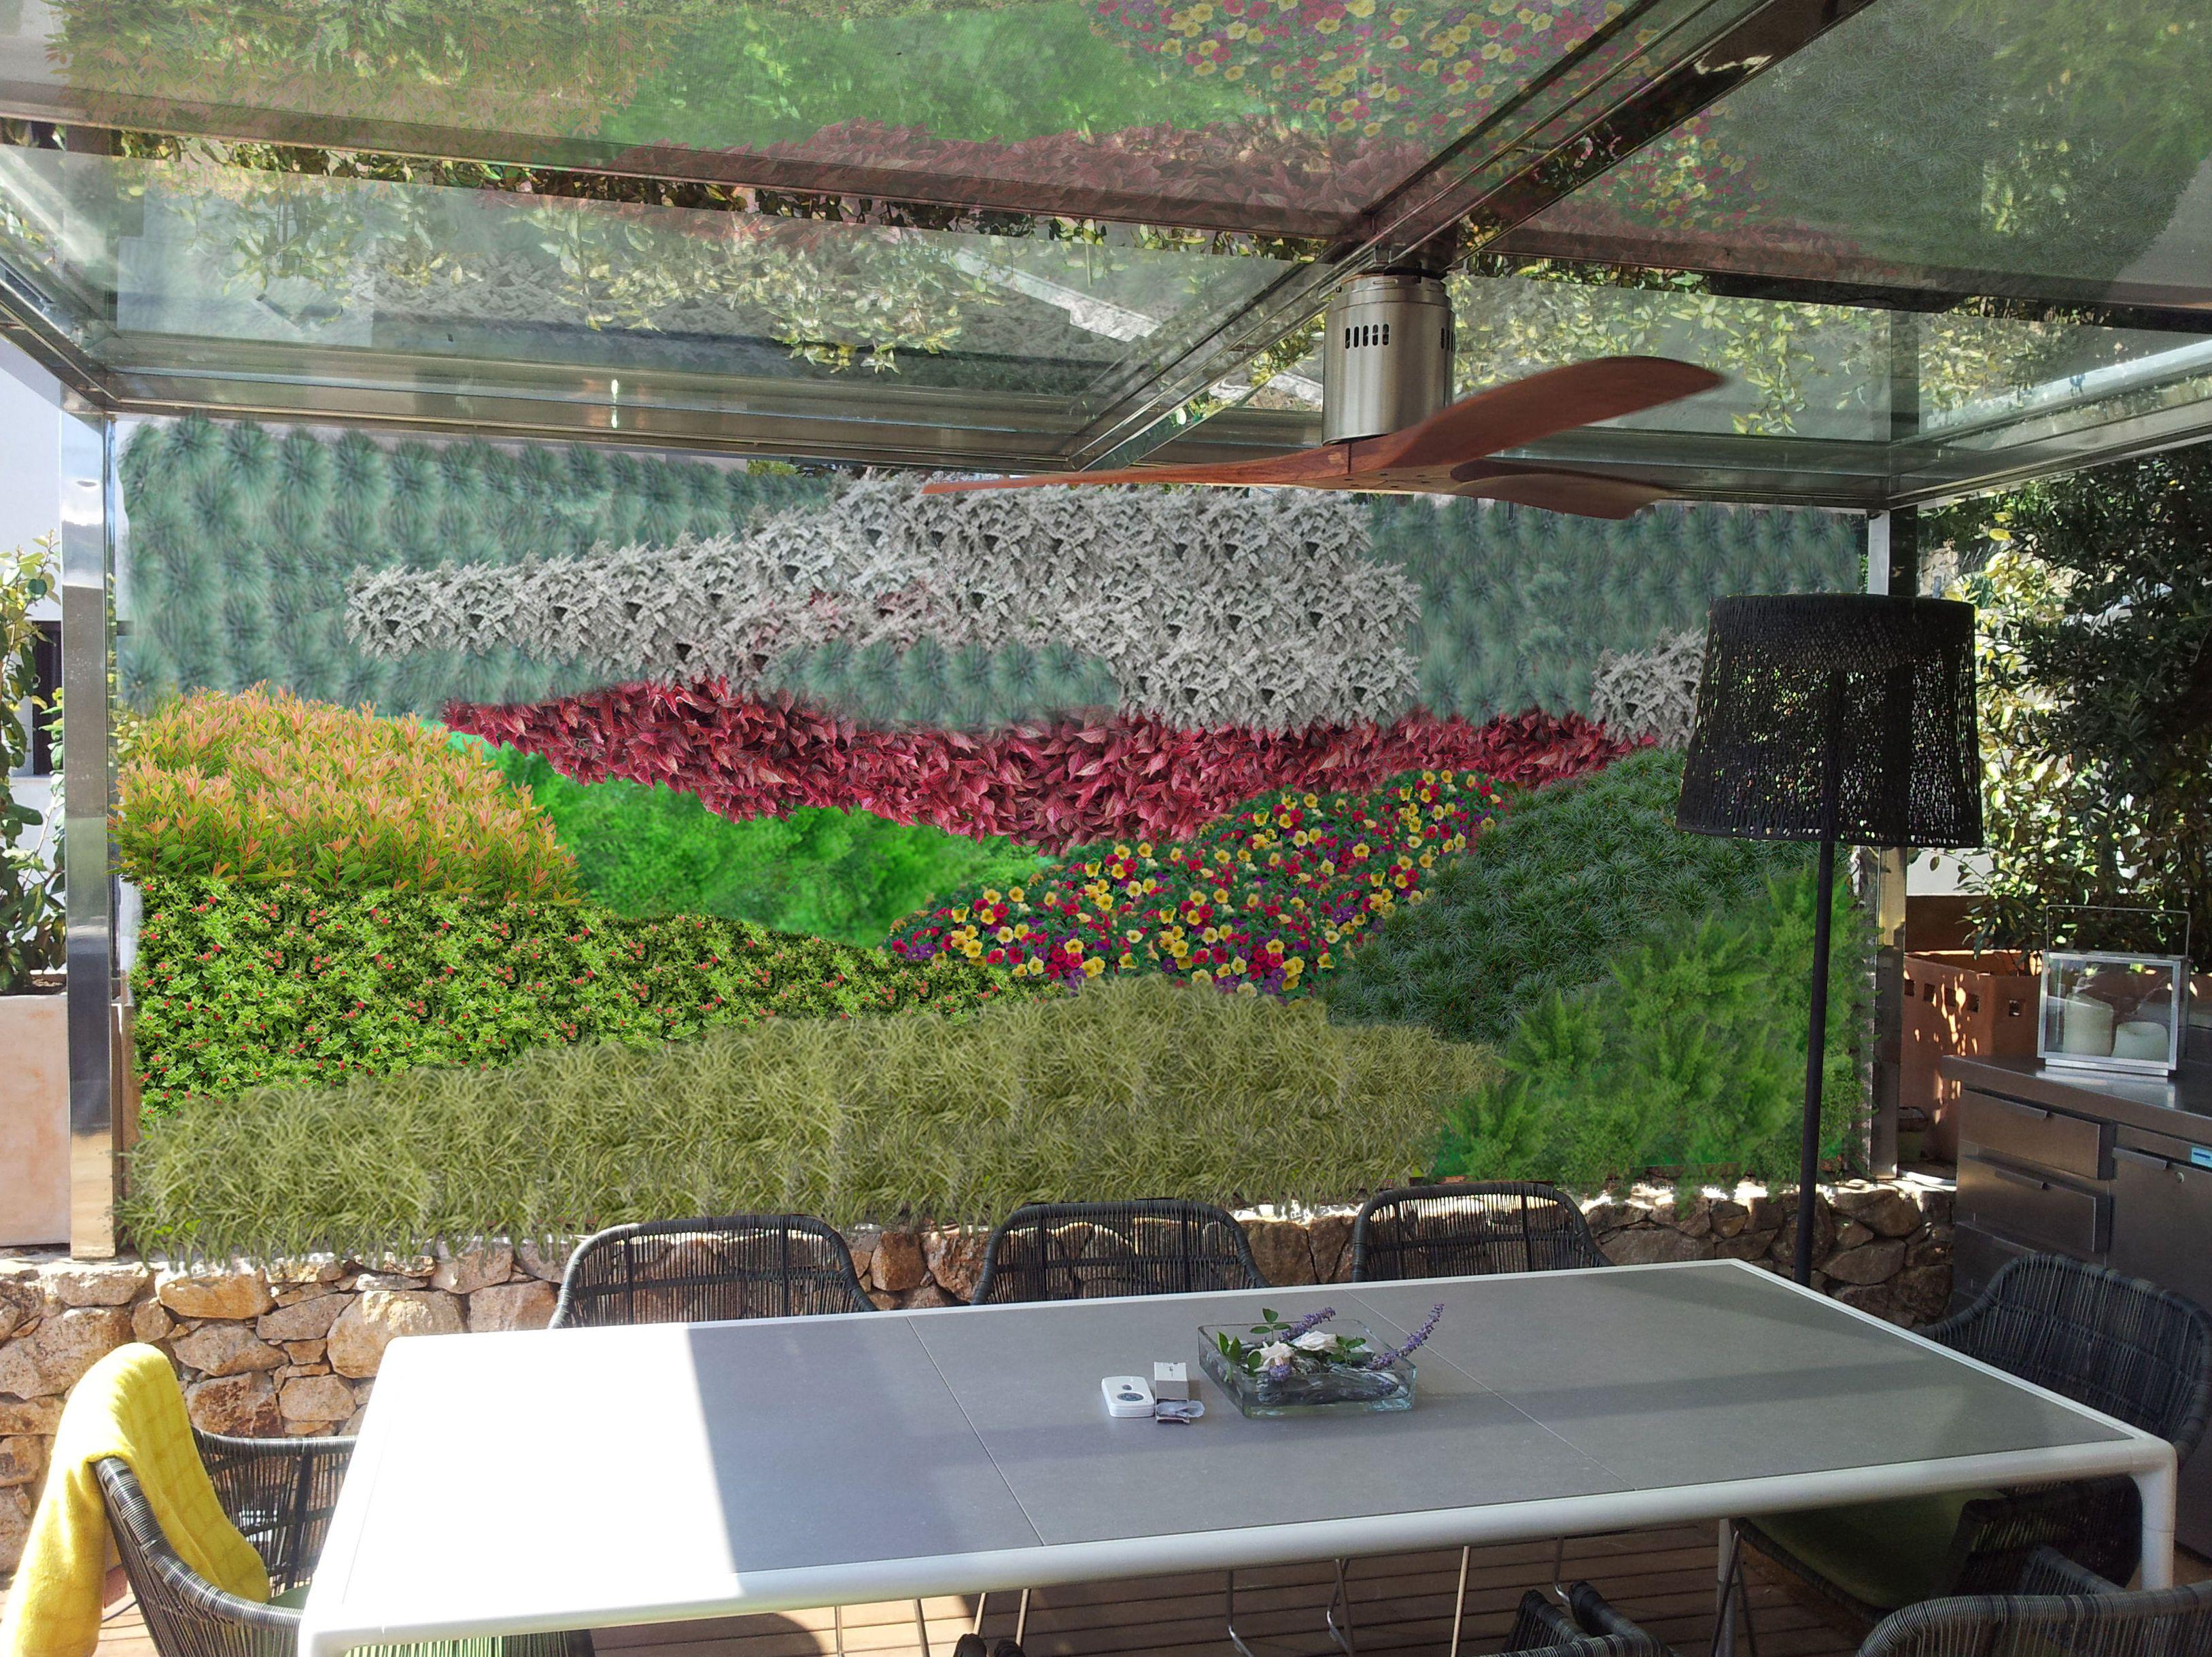 Jardines verticales en el vall s aquaplant disseny verd for Jardines verticales construccion